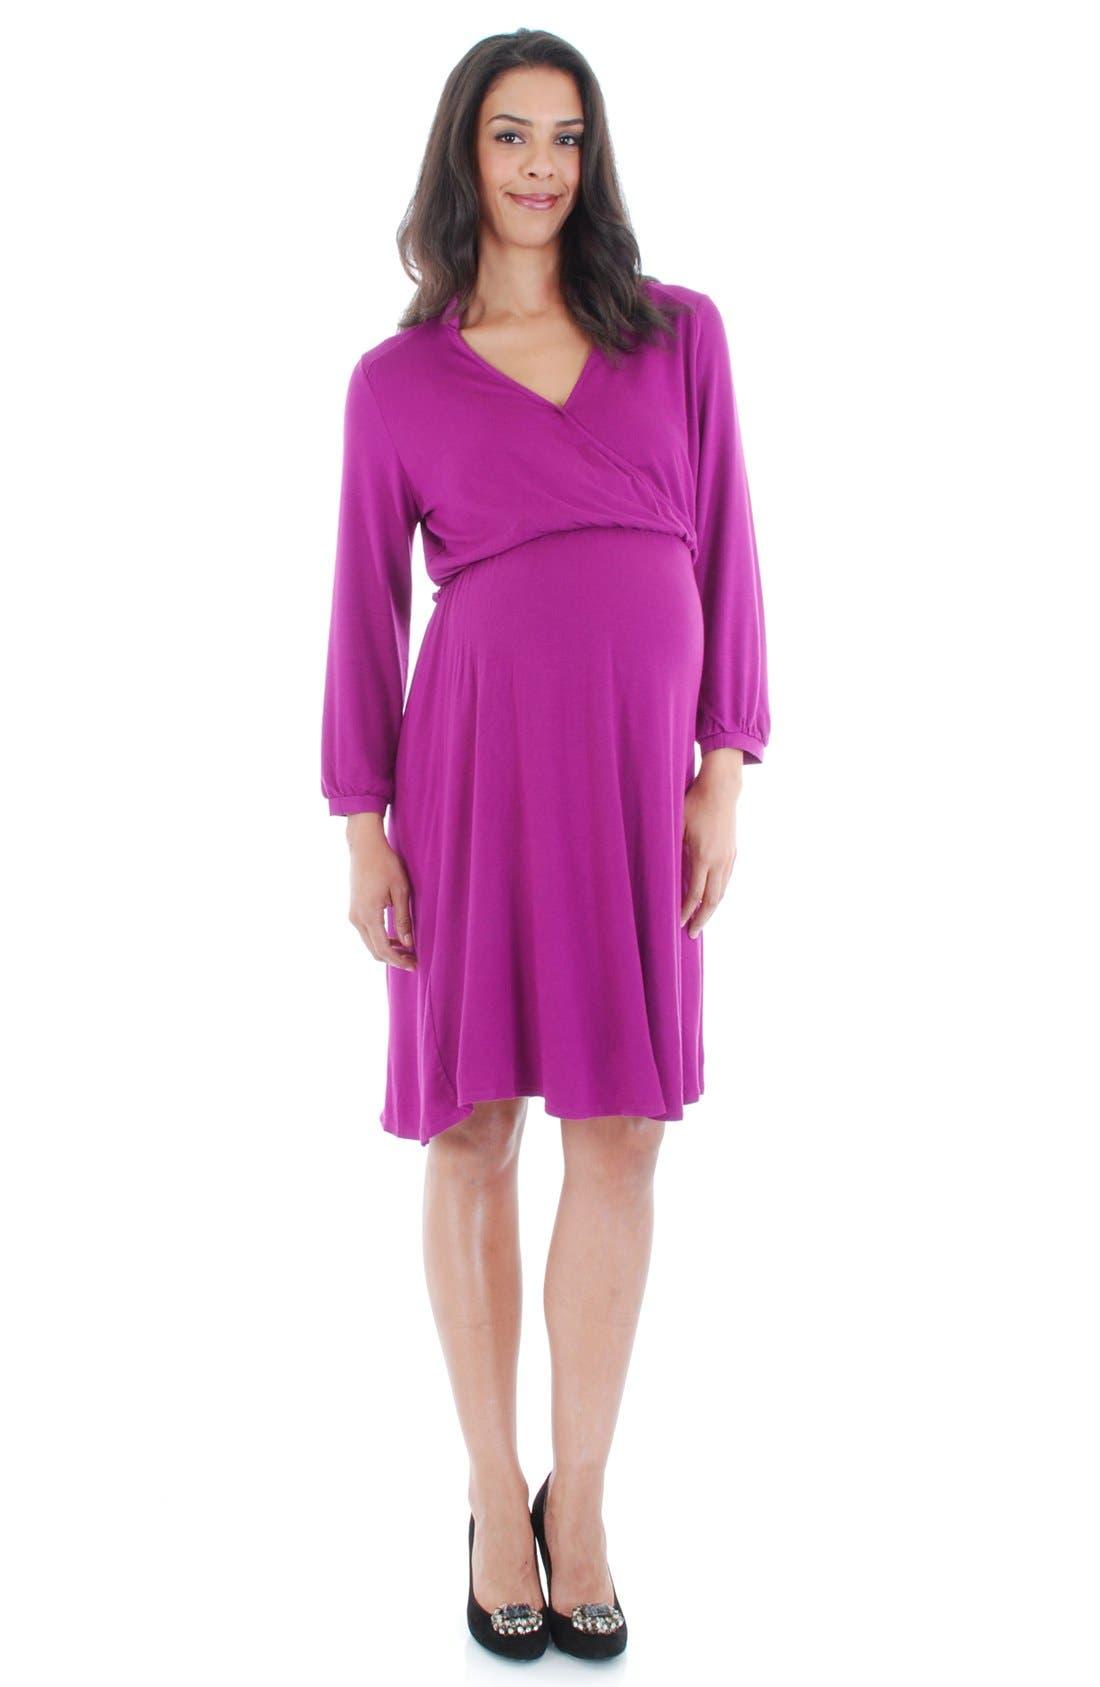 Main Image - EverlyGrey 'Sicily' Maternity/Nursing Dress